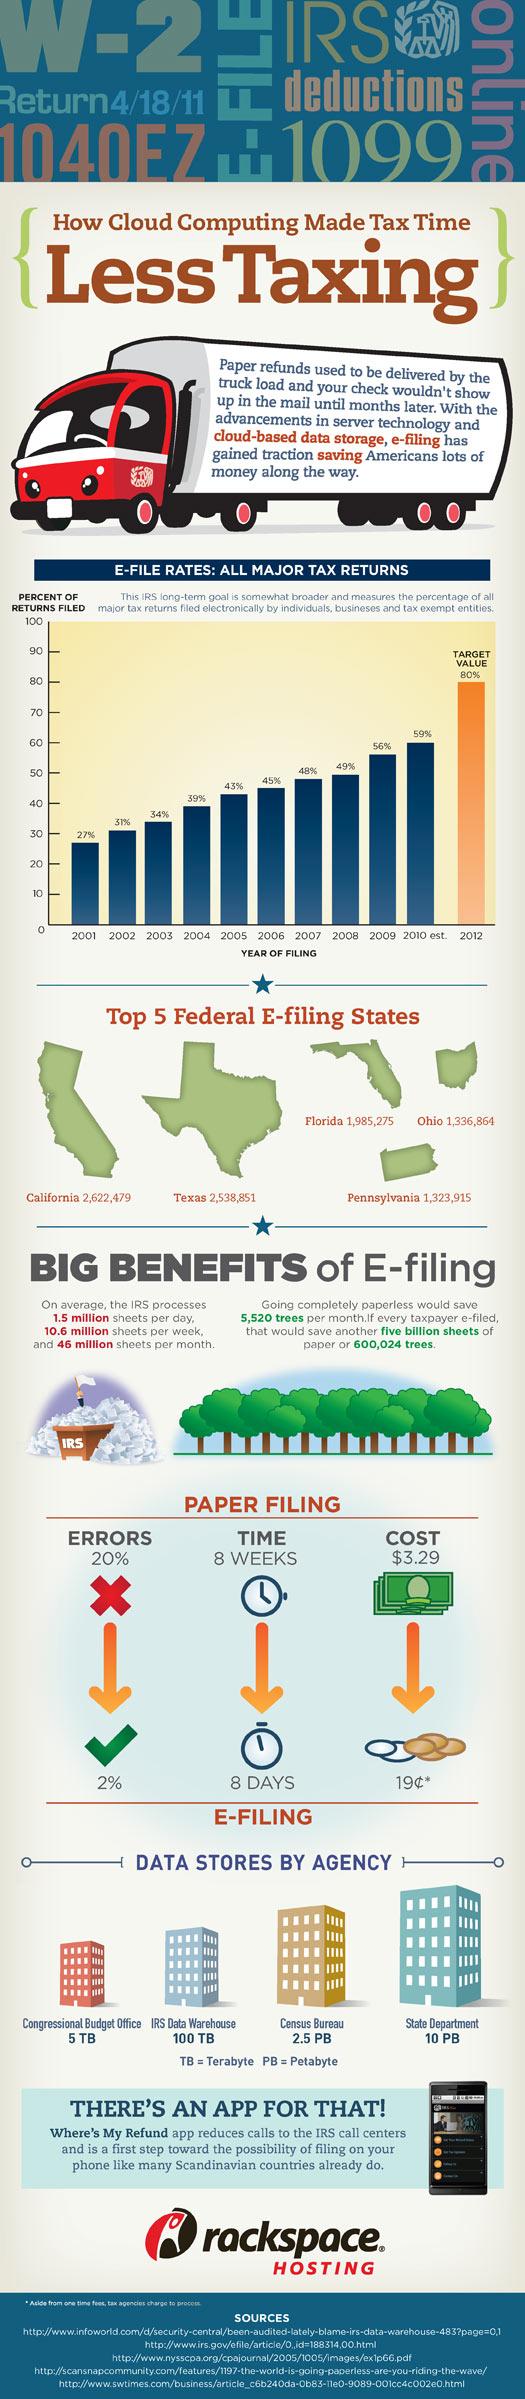 e-filing infographic